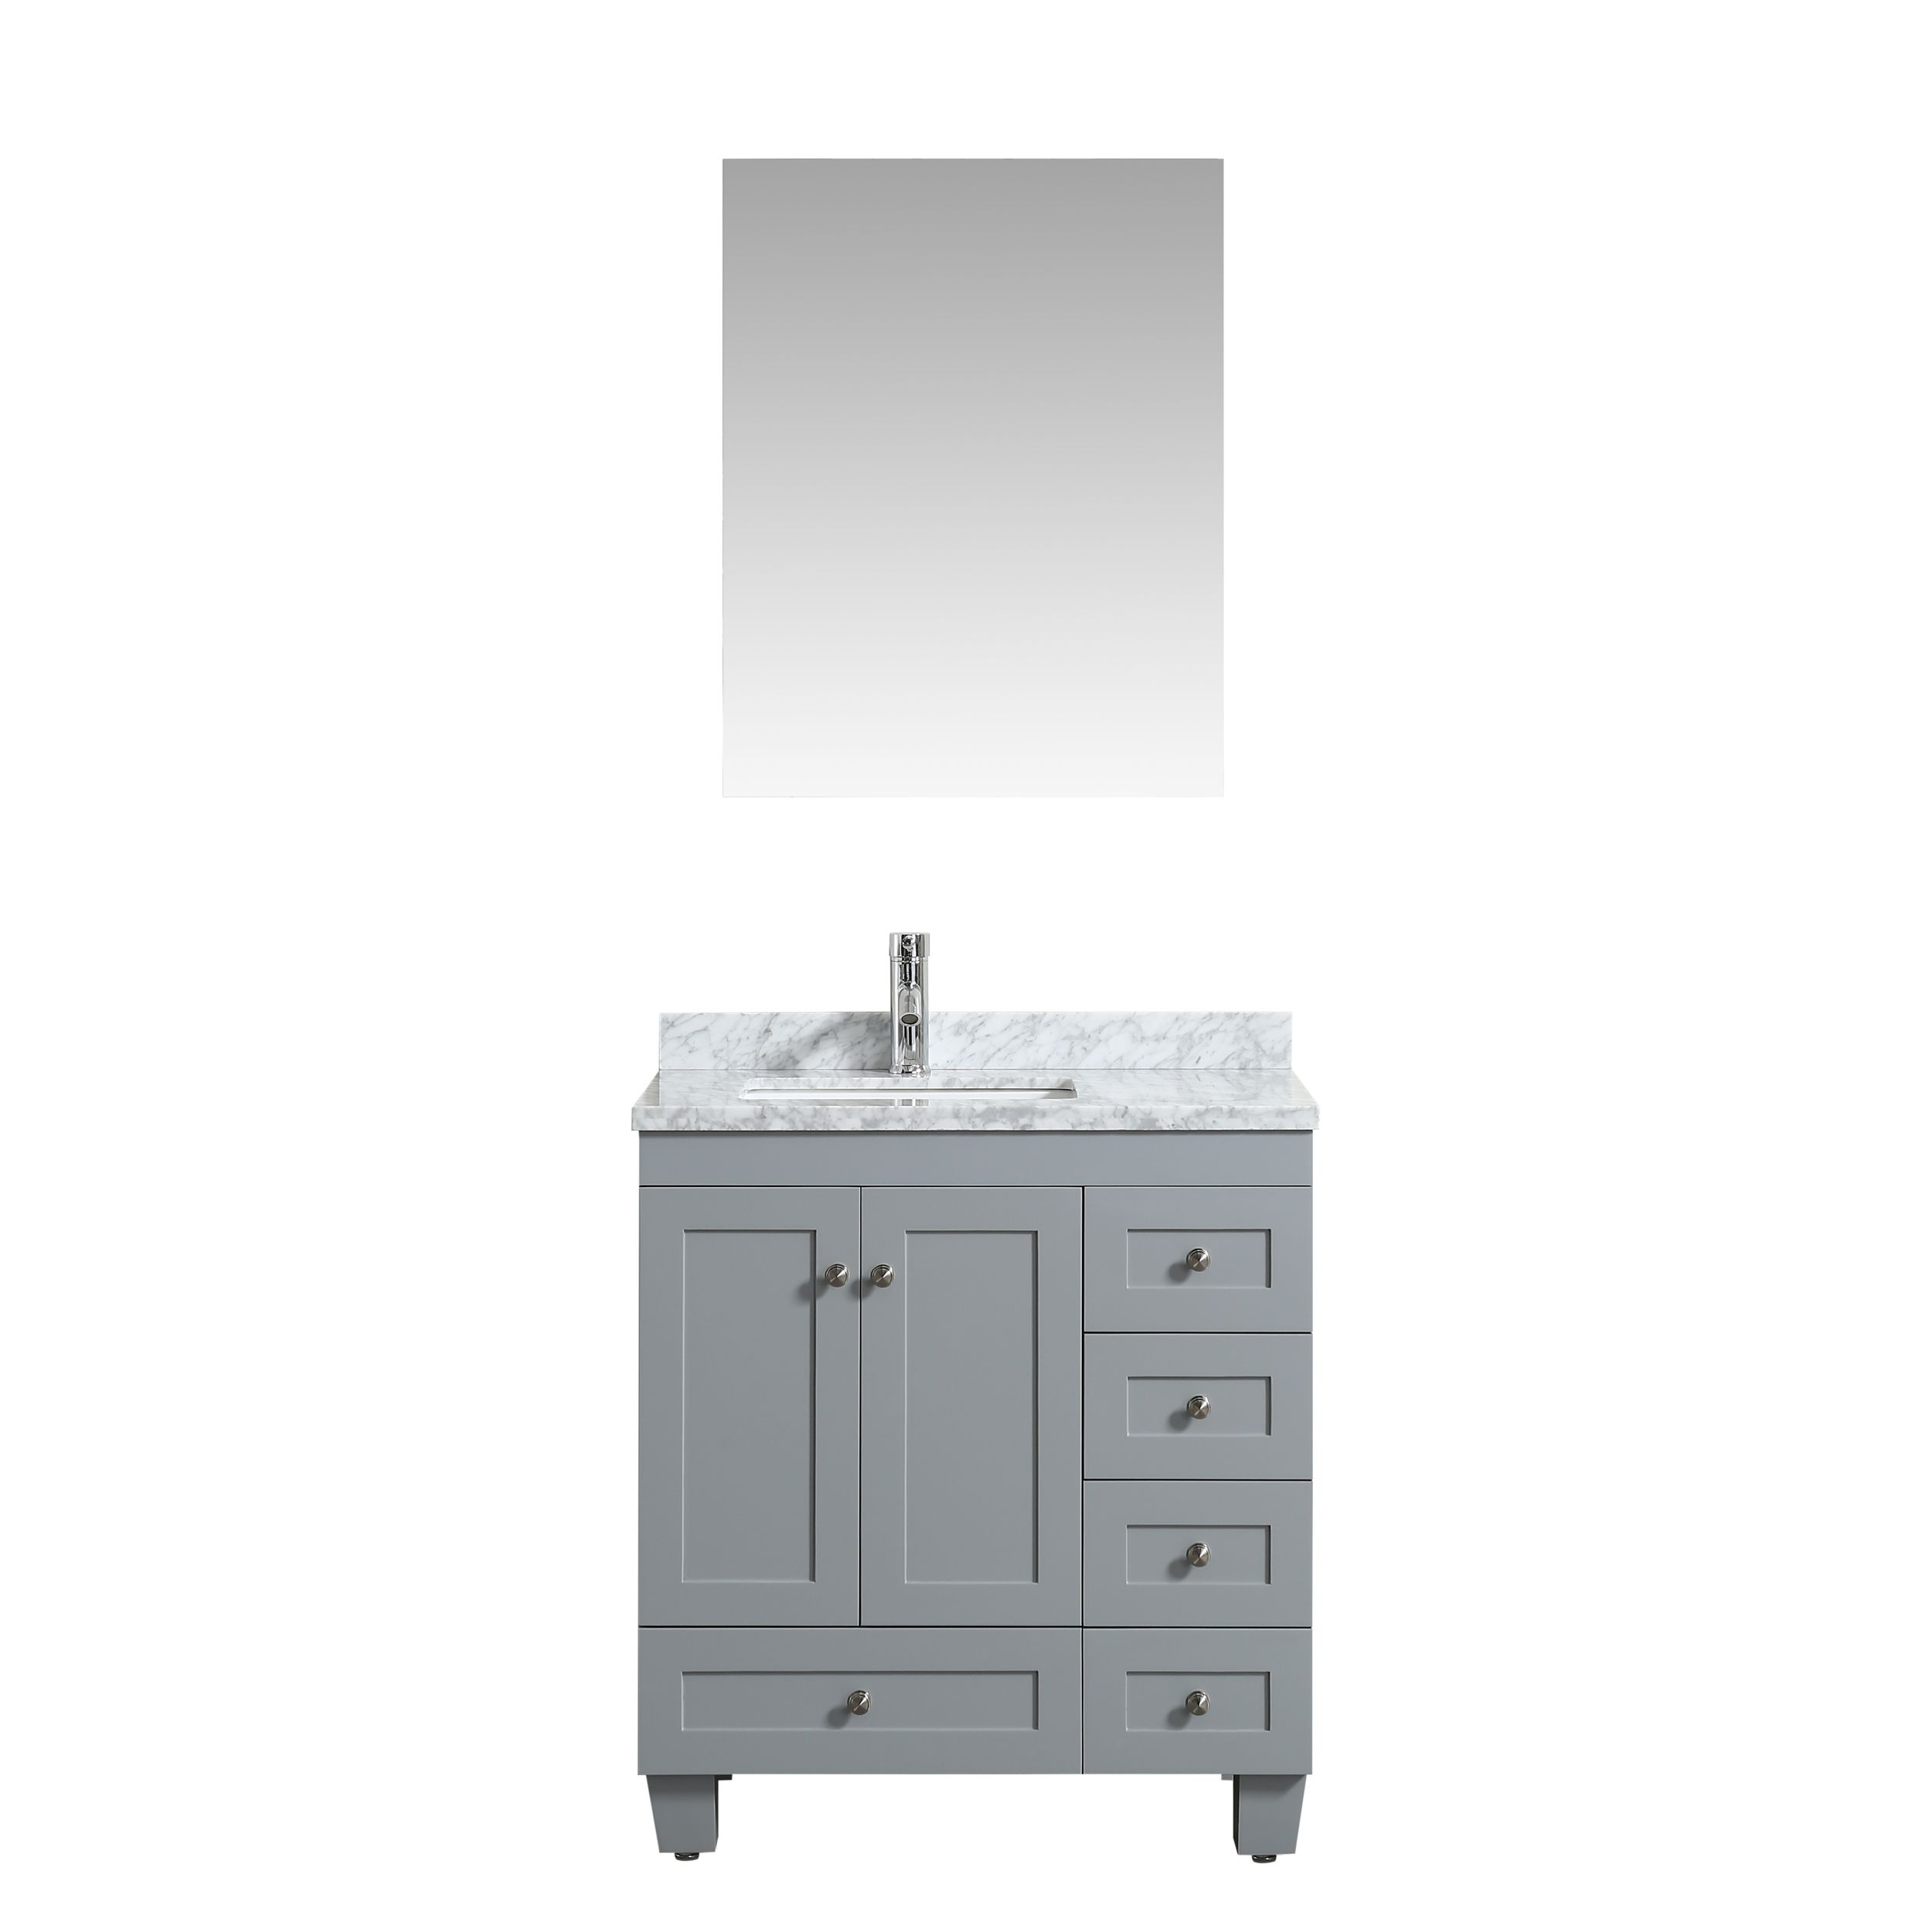 13++ Bathroom vanity 30 x 18 ideas